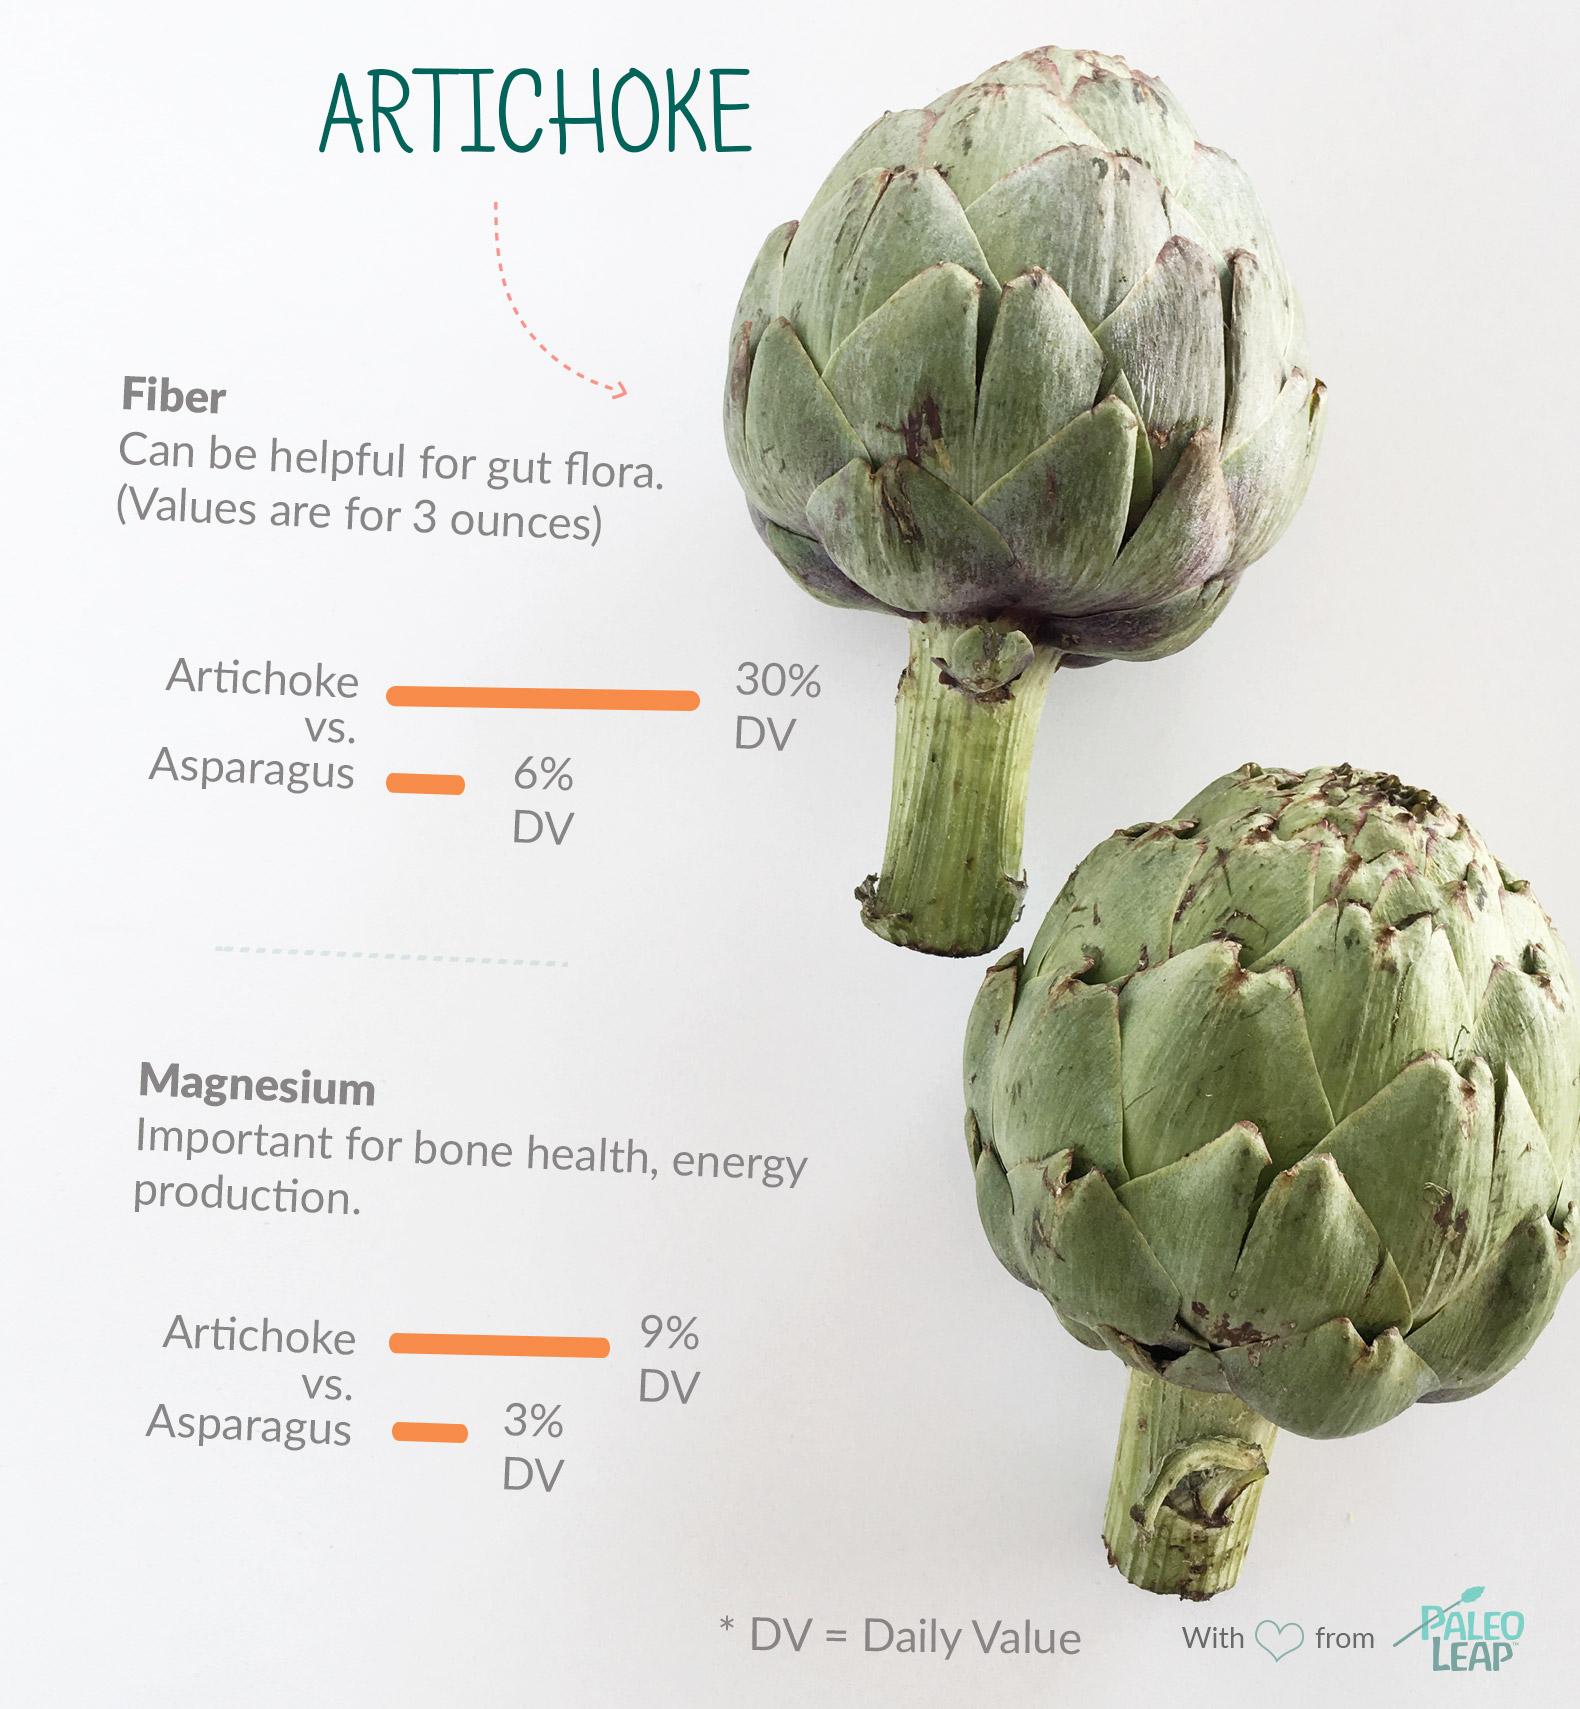 Artichoke highlights